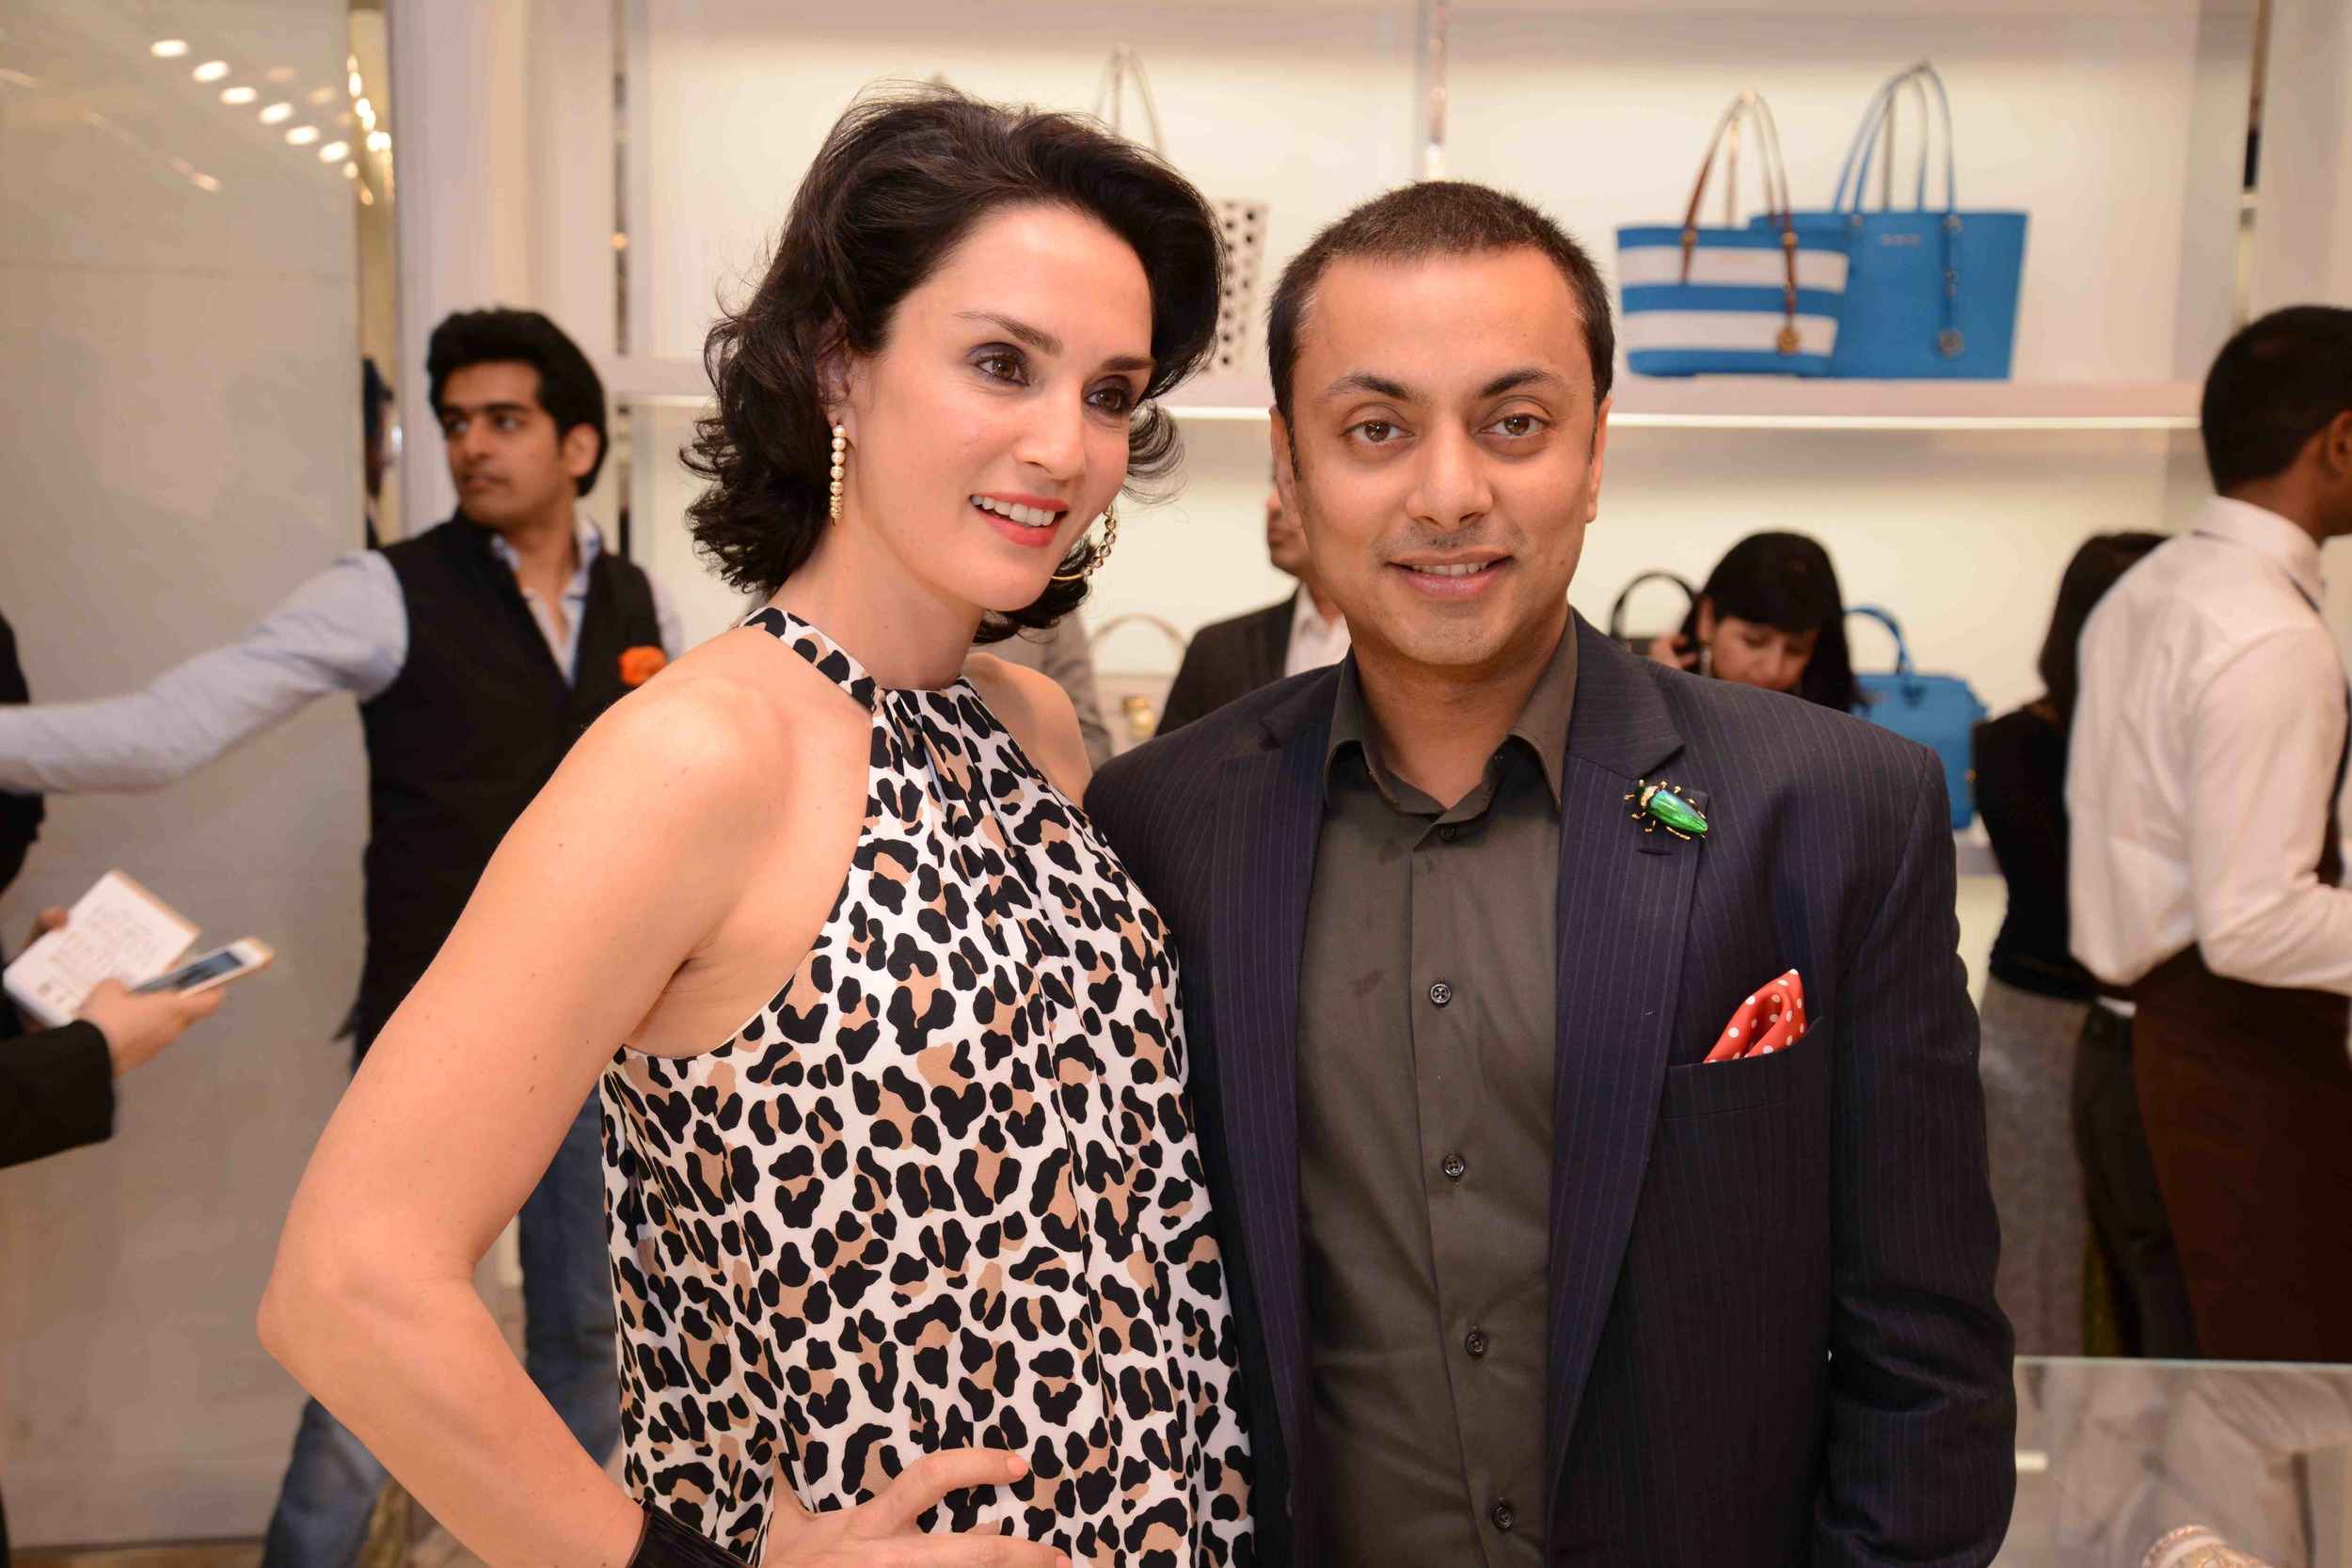 Sonya Jehan and Vikram Baidyanath